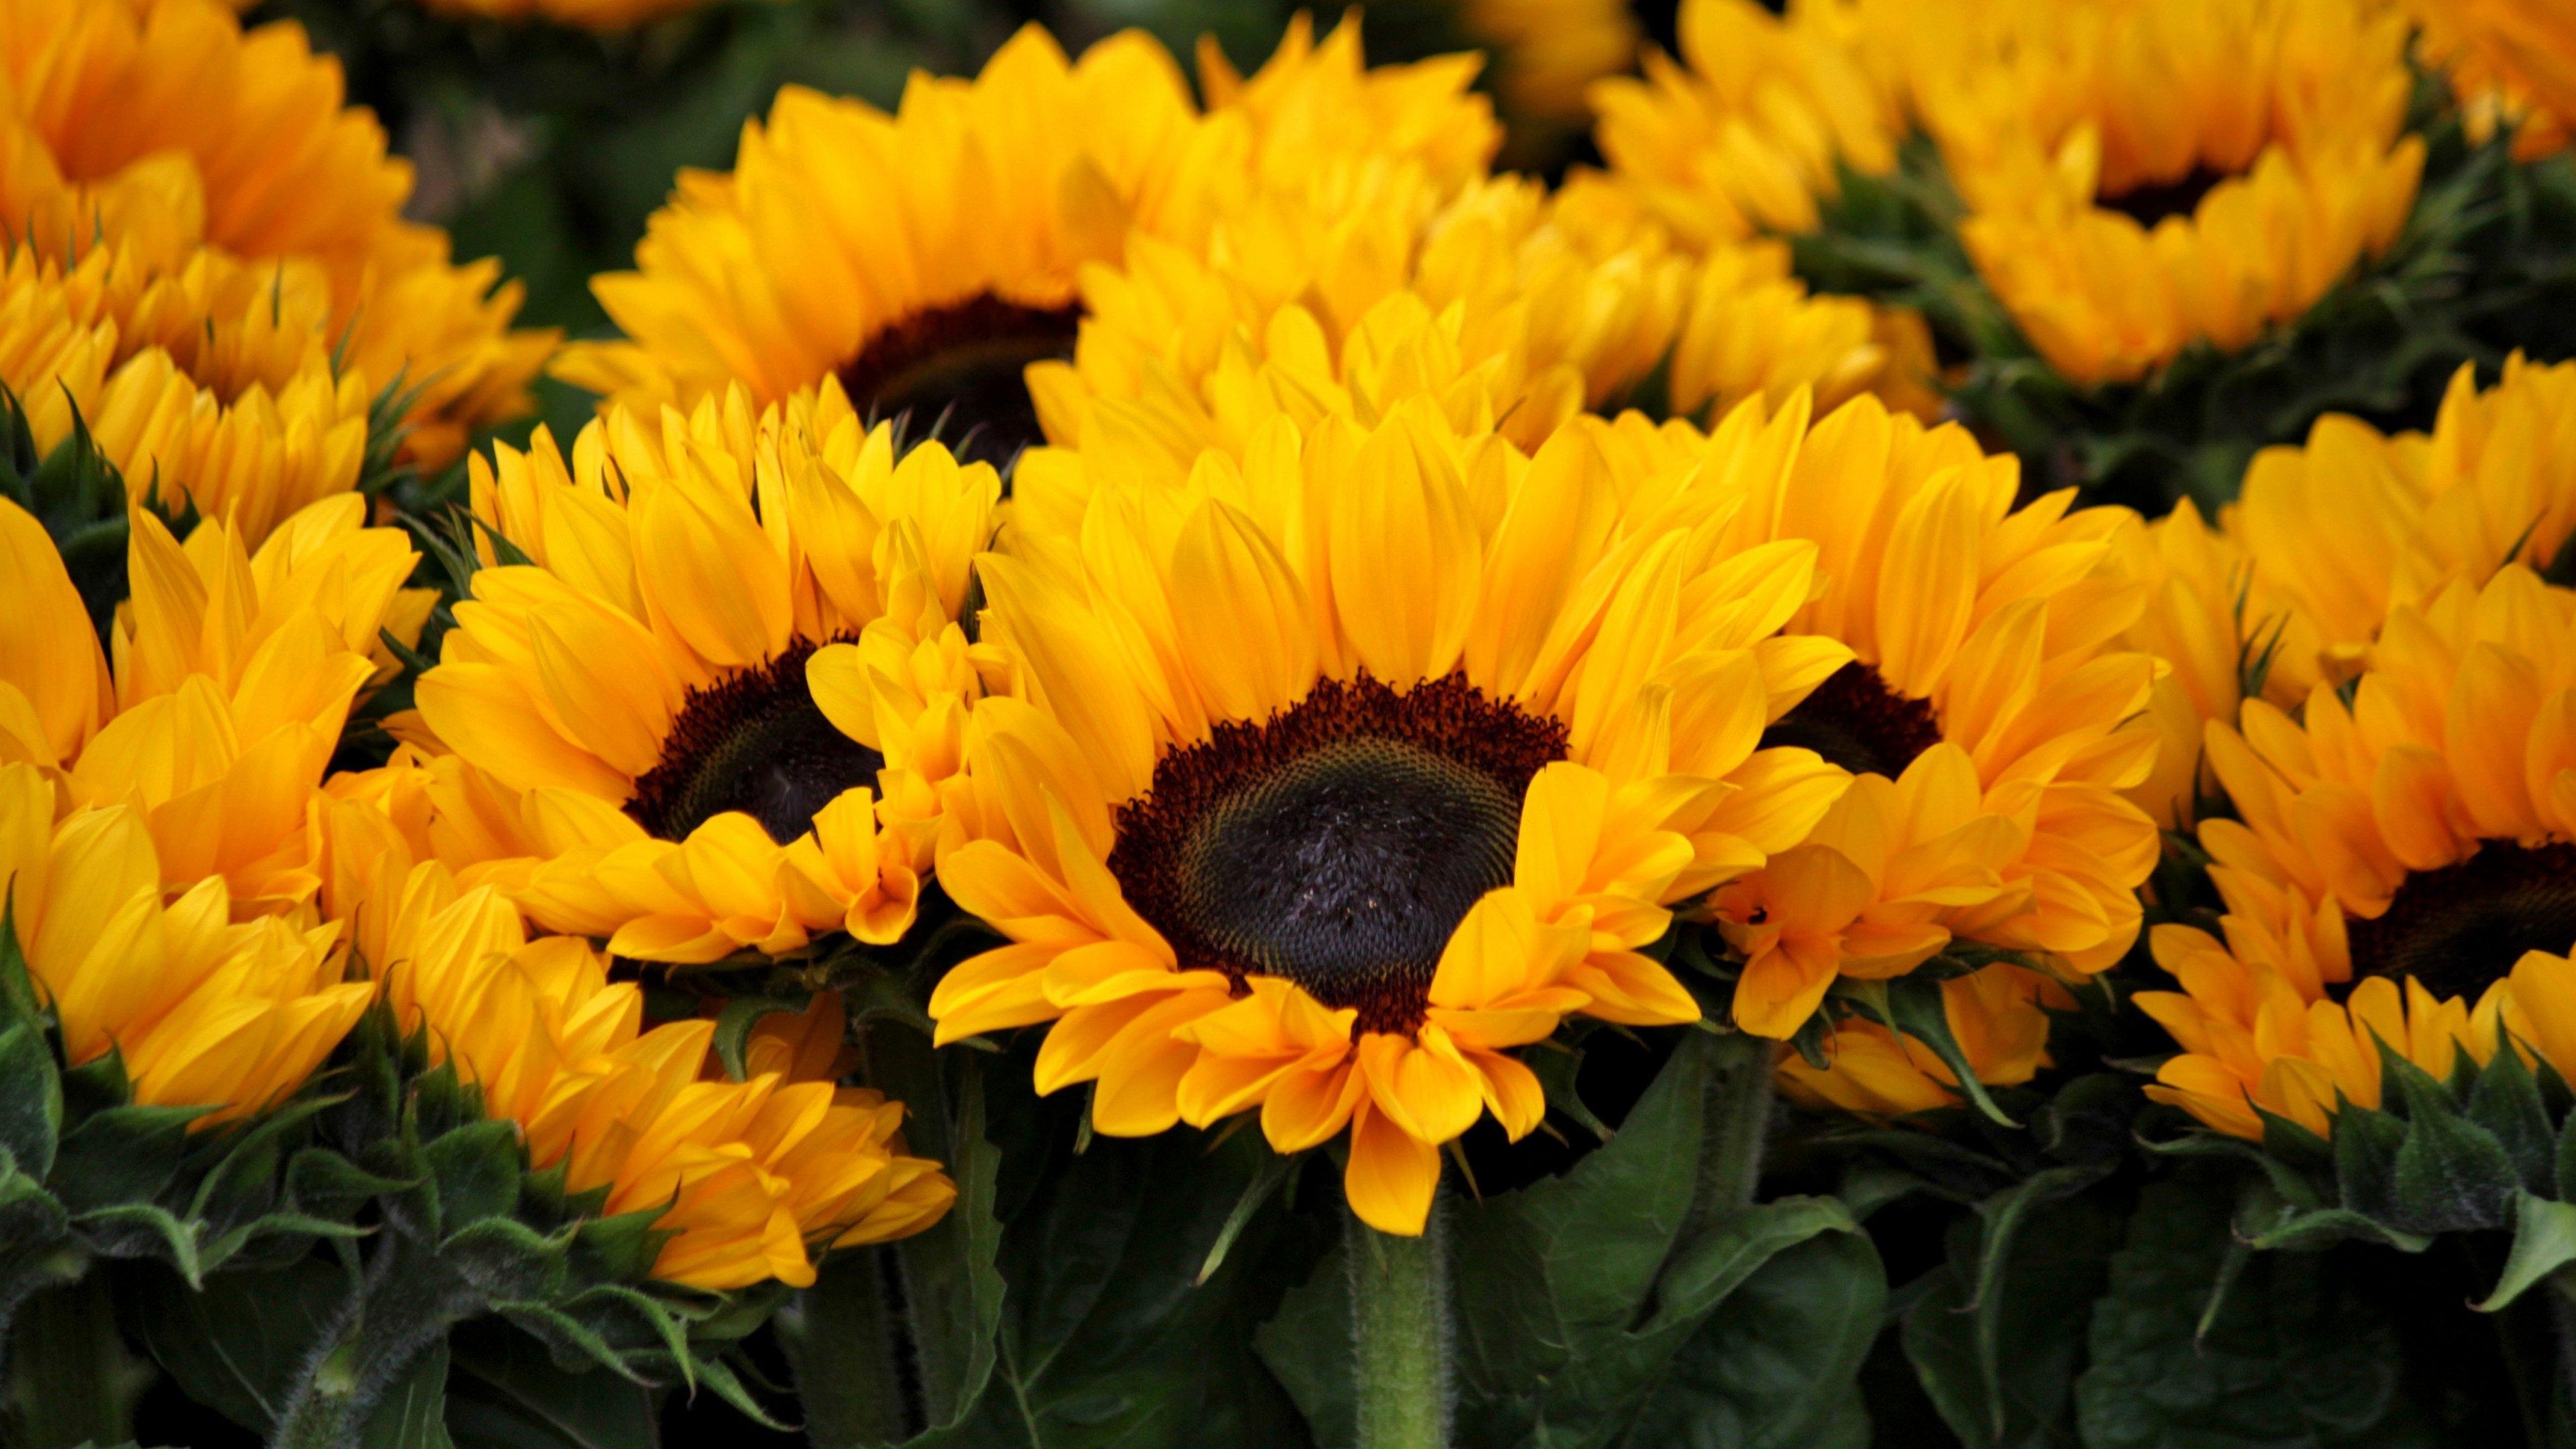 Sunflower Wallpaper Desktop Posted By Ryan Mercado